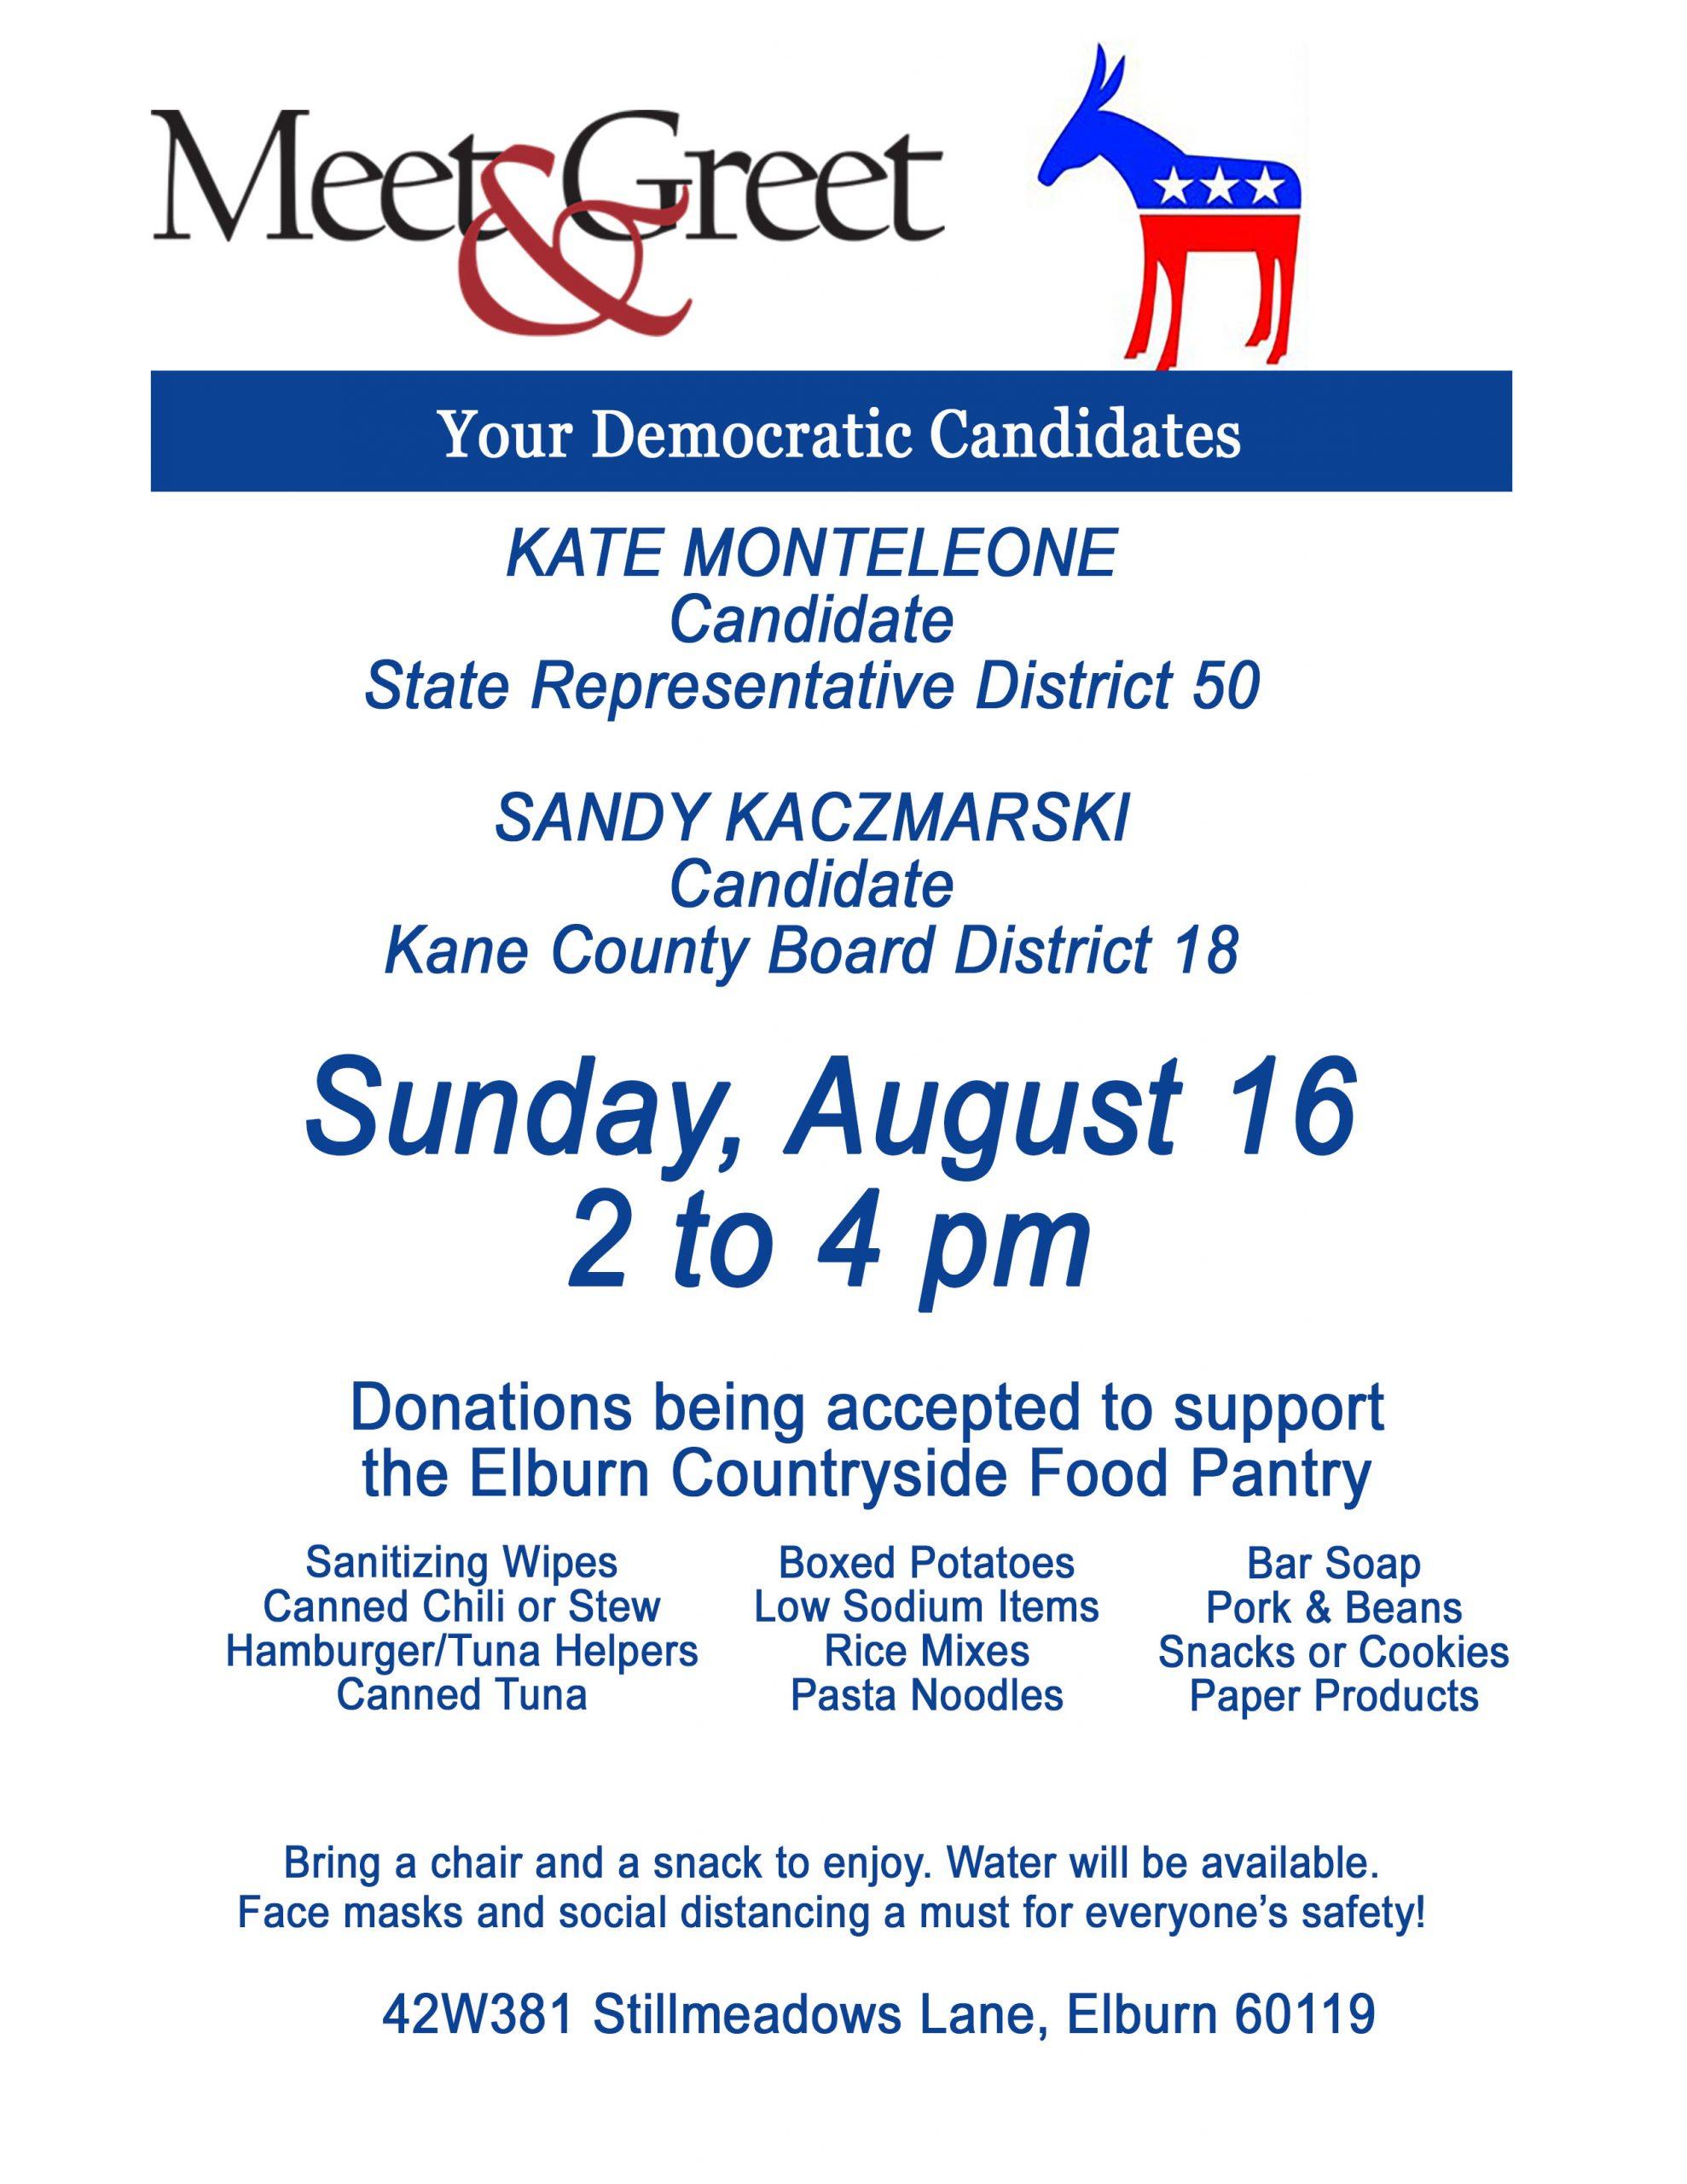 Meet & Greet Kate Monteleone and Sandy Kaczmarski @ Private Residence